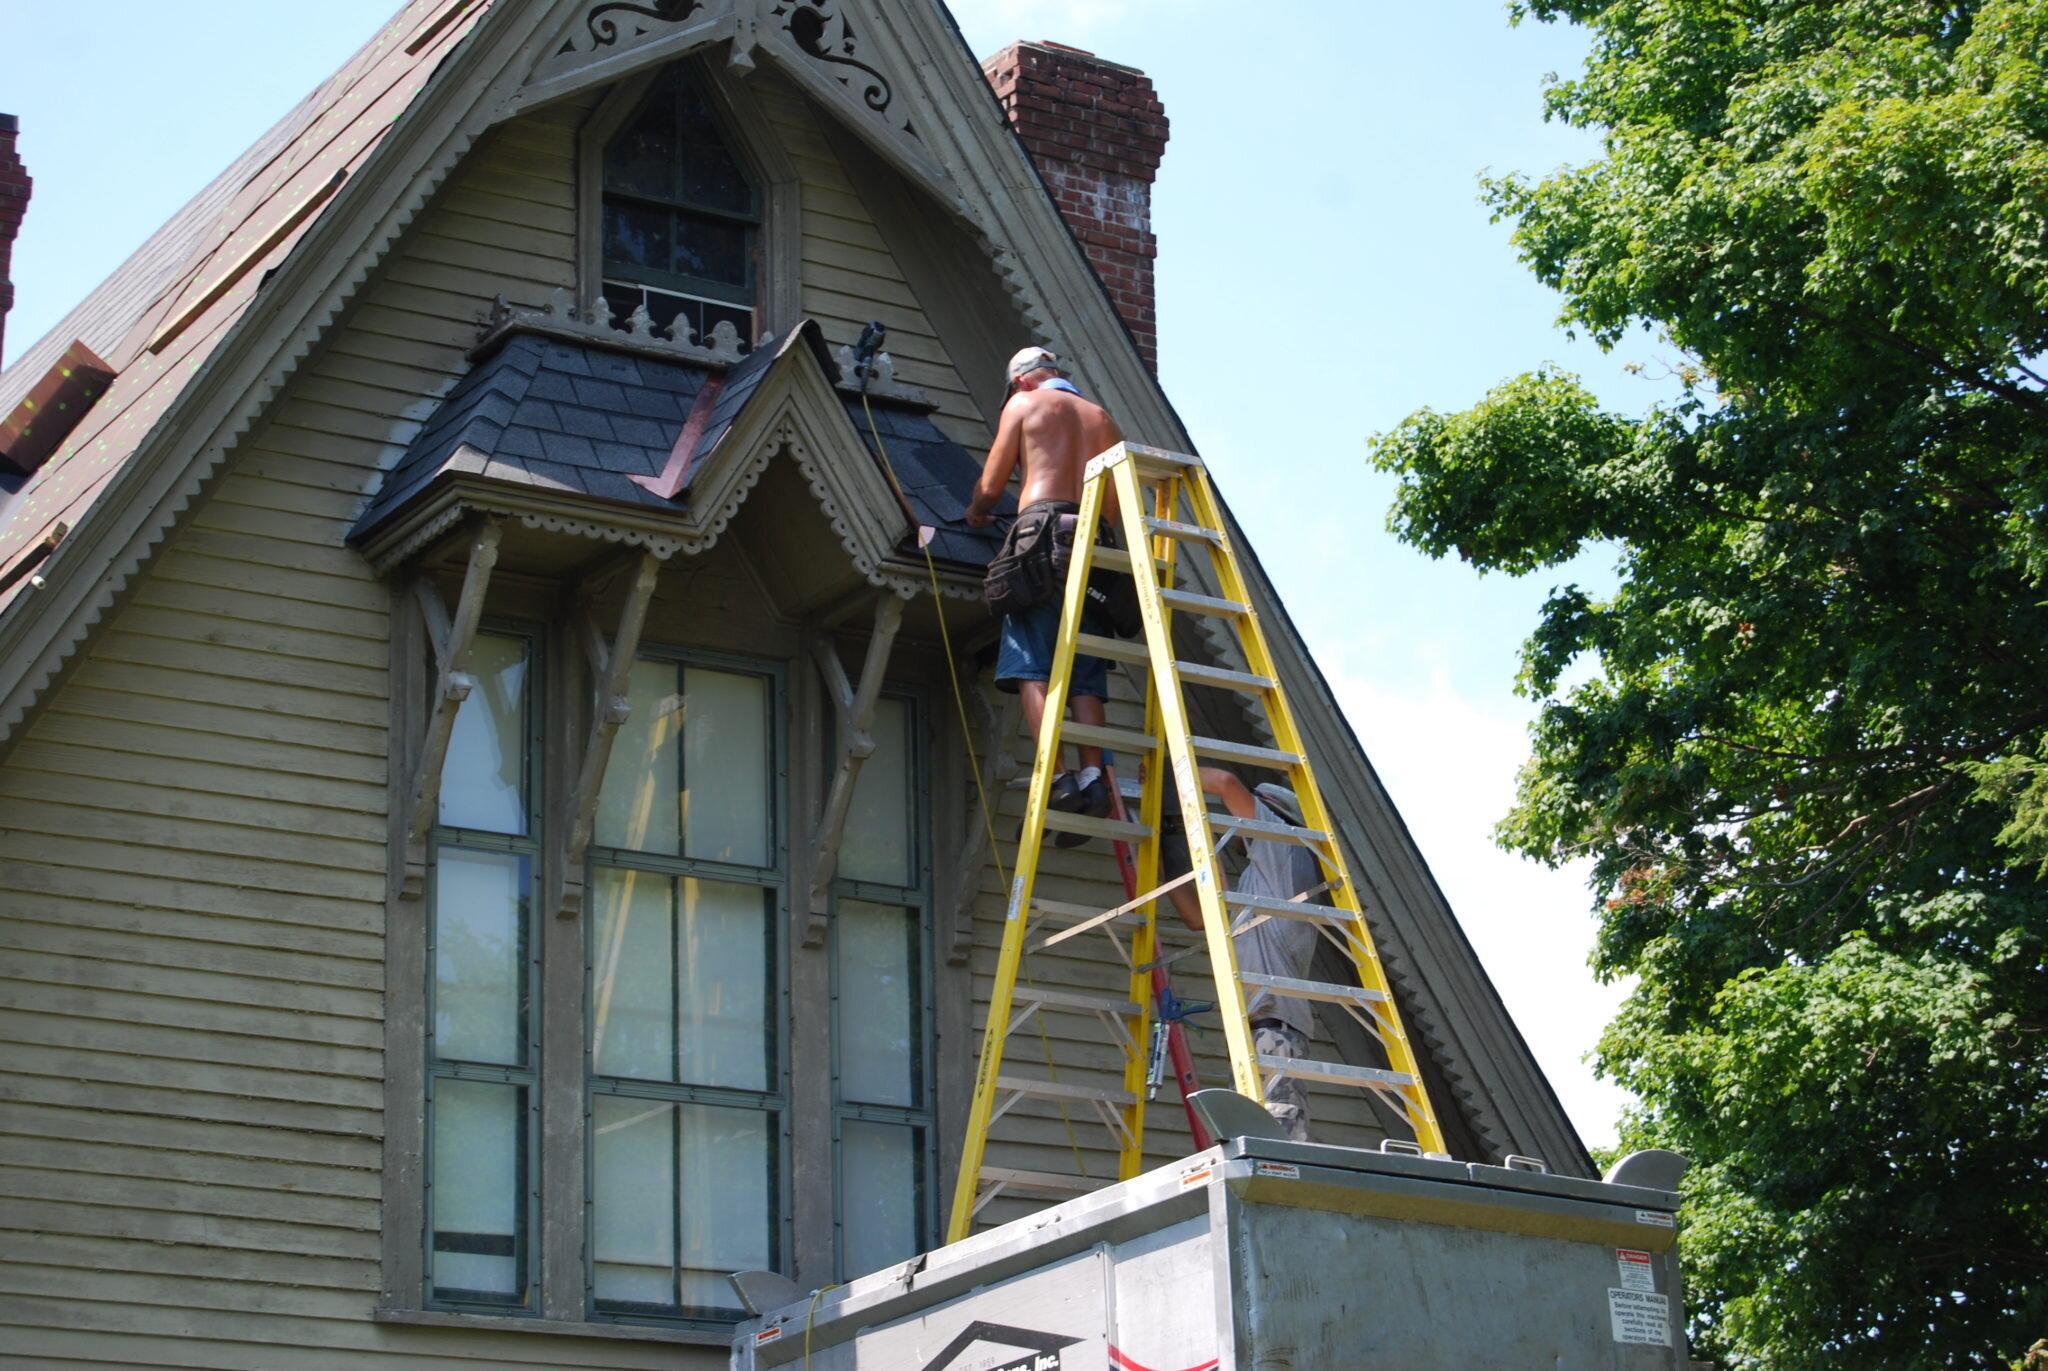 Cottage-Roof-August-19-2019.jpg